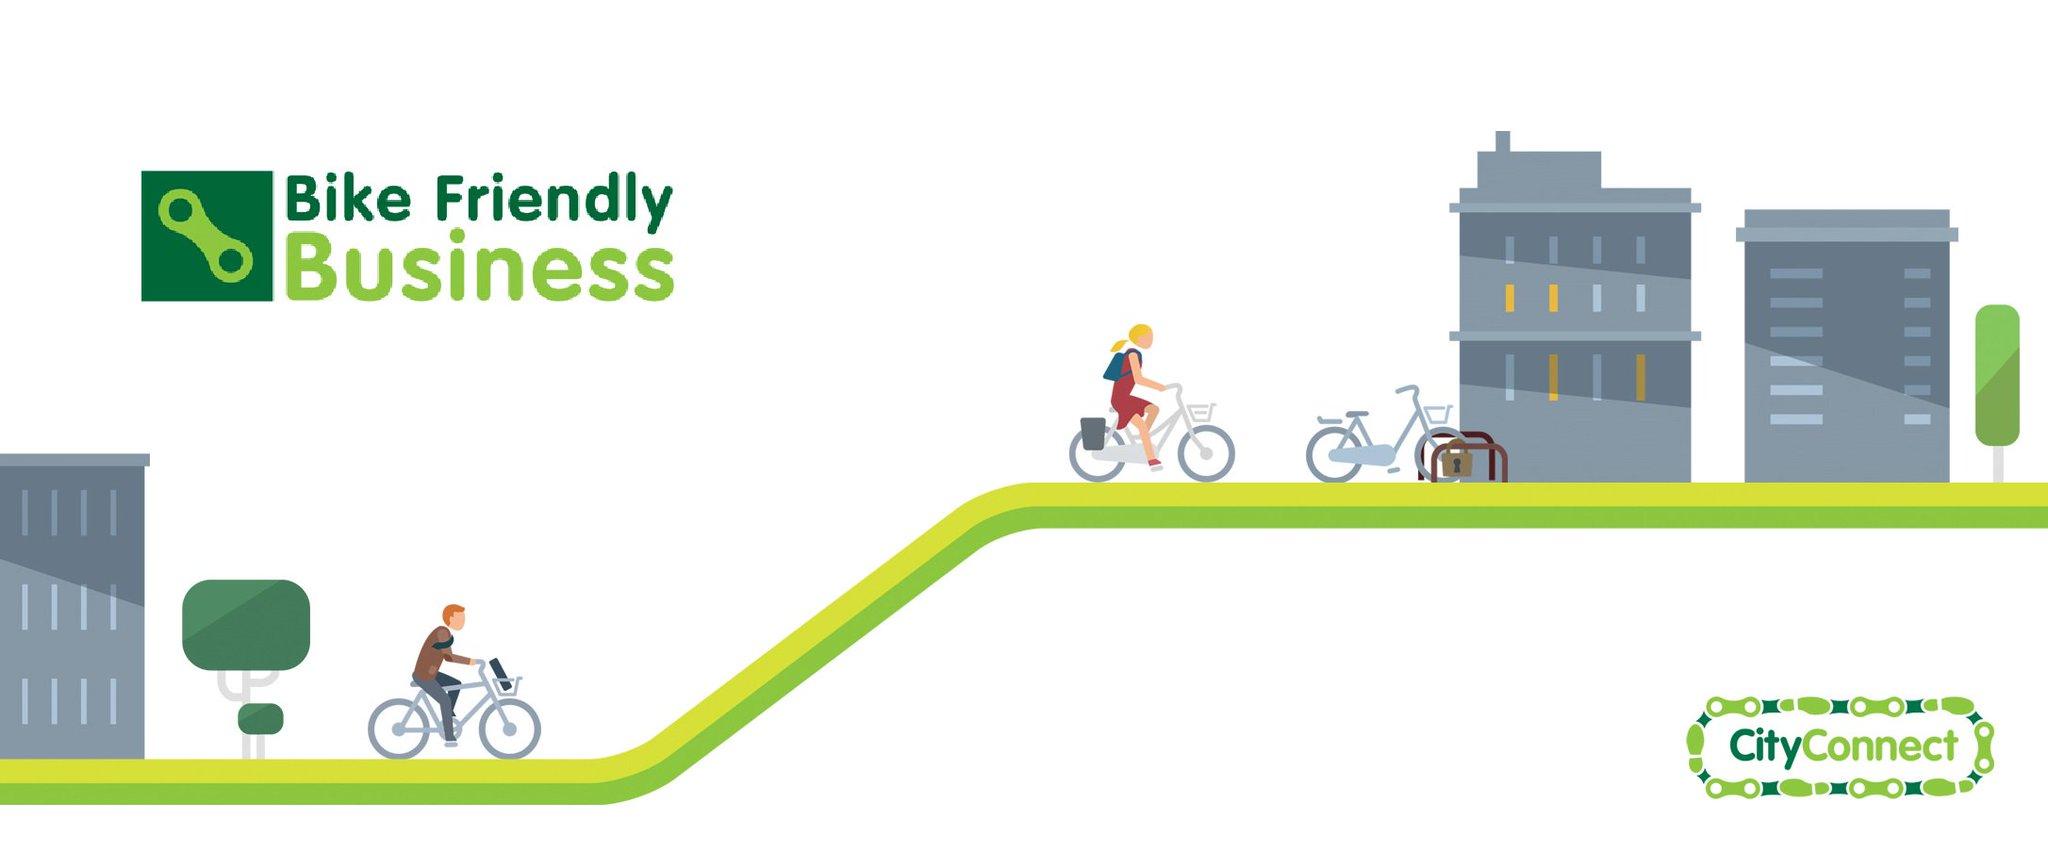 FREE Bike Friendly Business masterclass, 11 May, 10.30am - 12pm in #Bradford. https://t.co/KQAZ0VHpRR  @bradfordmdc #Cycleactivecity https://t.co/8Y0chwVqml